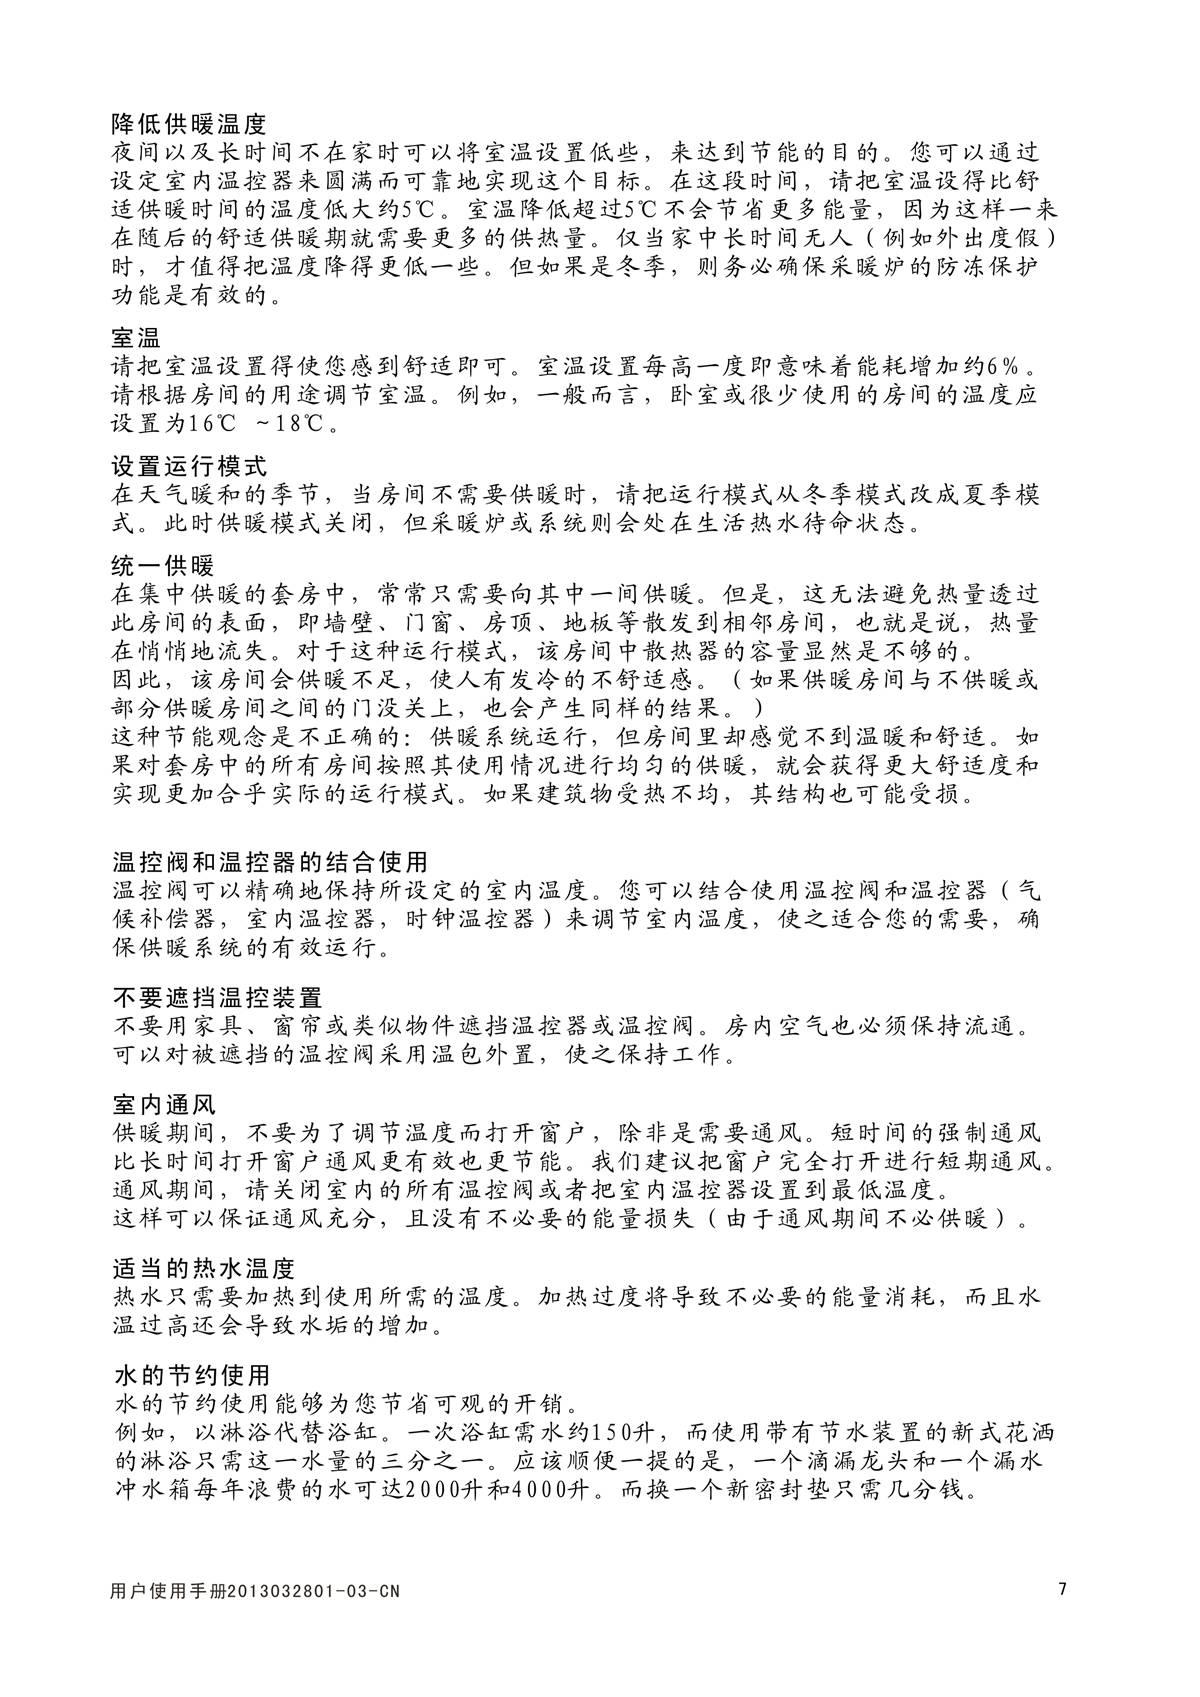 ES06系列-用户使用手册-8_02.jpg